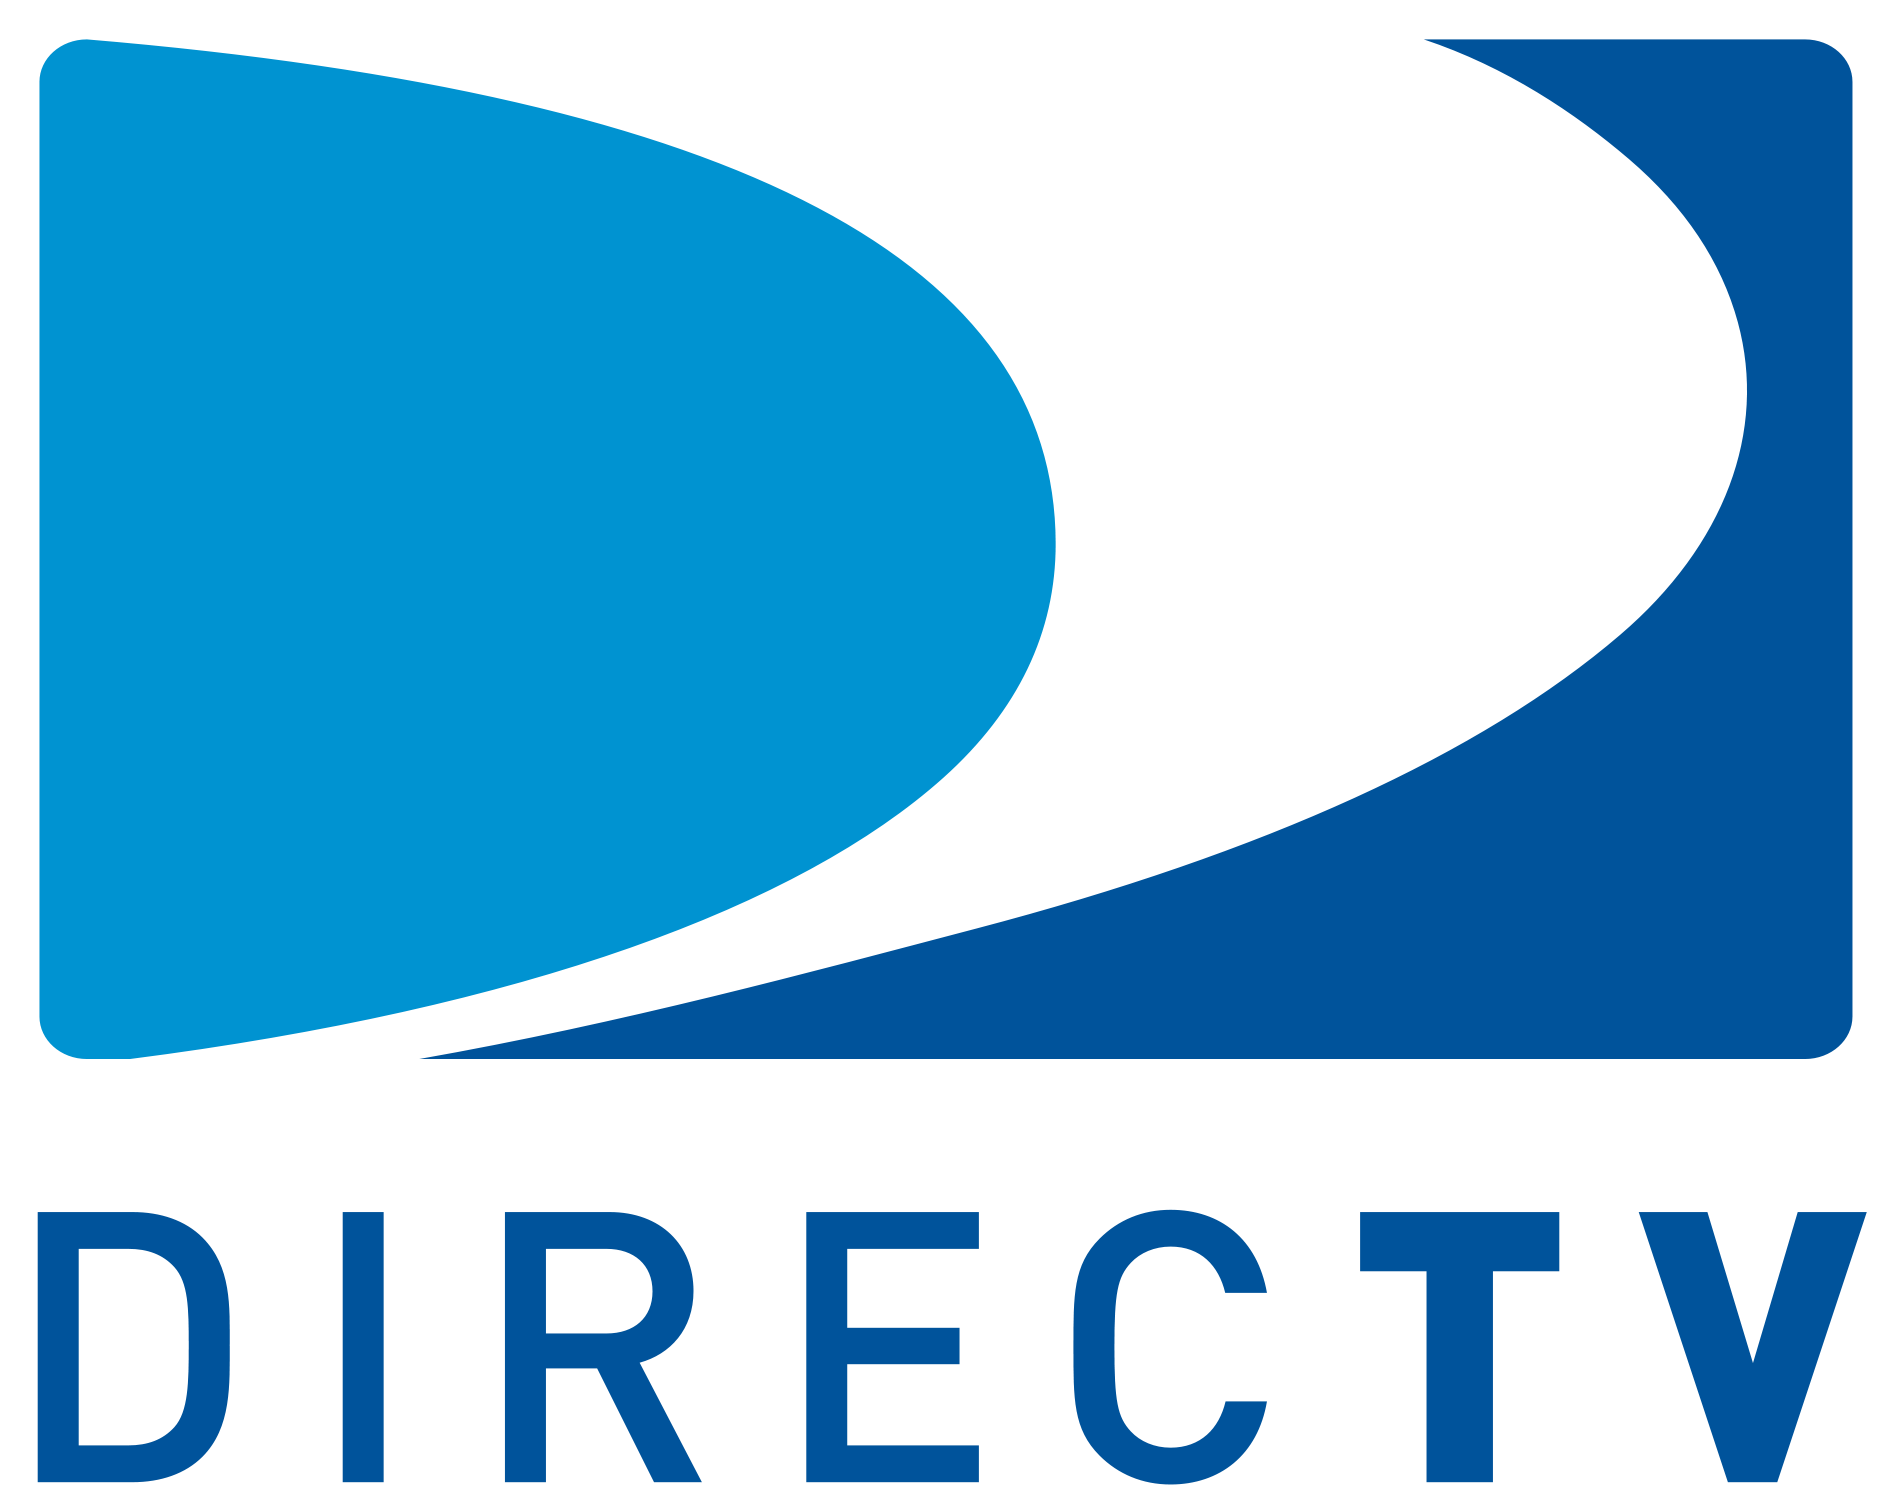 Logo Google Search Directv Satellite Tv Tv Reviews